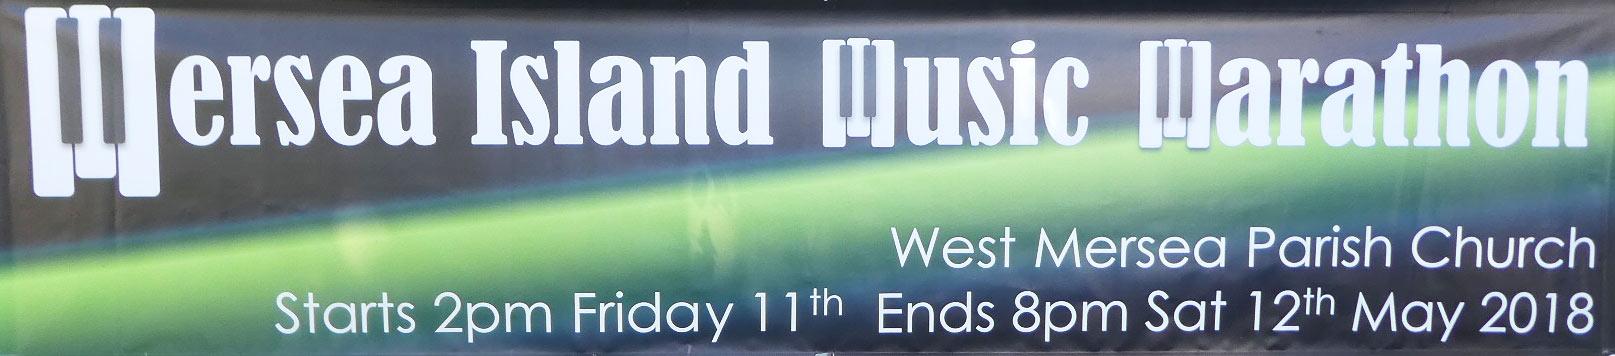 Mersea Island Music Marathon